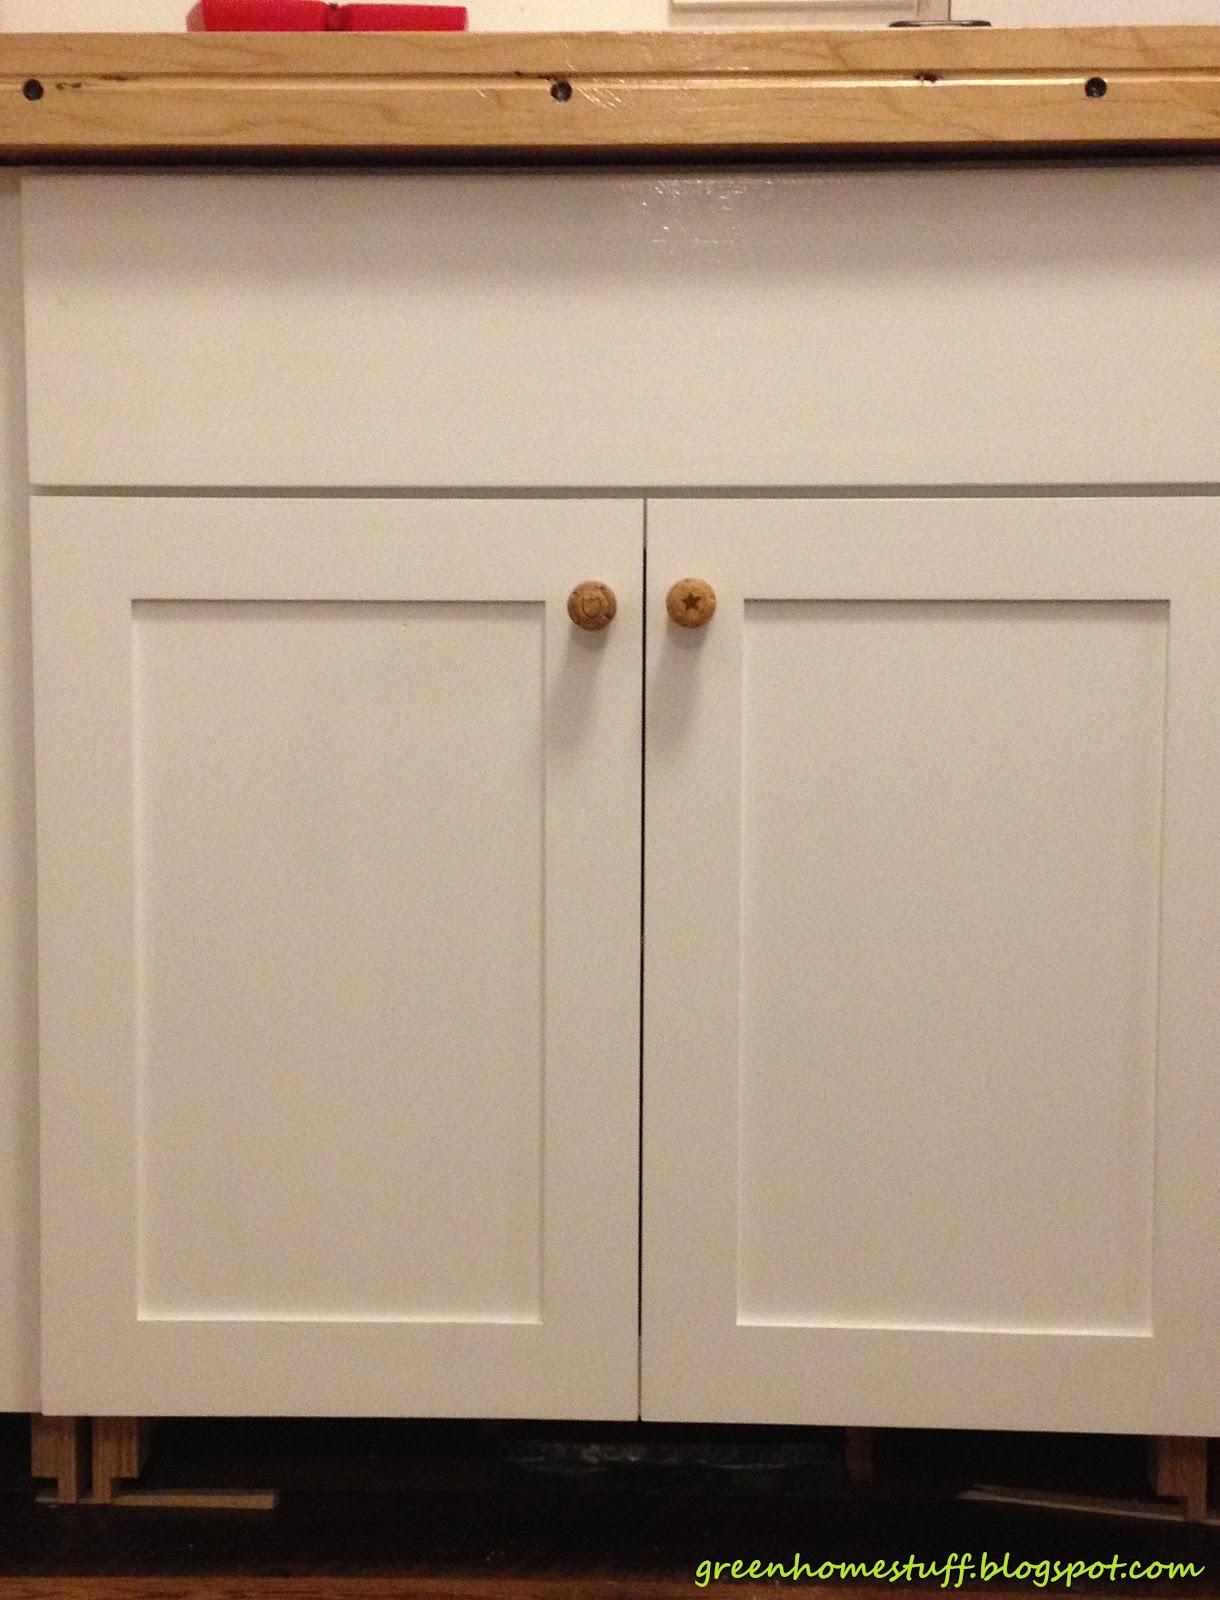 Green Home Stuff: Repurposed Champagne Cork Cabinet Knobs